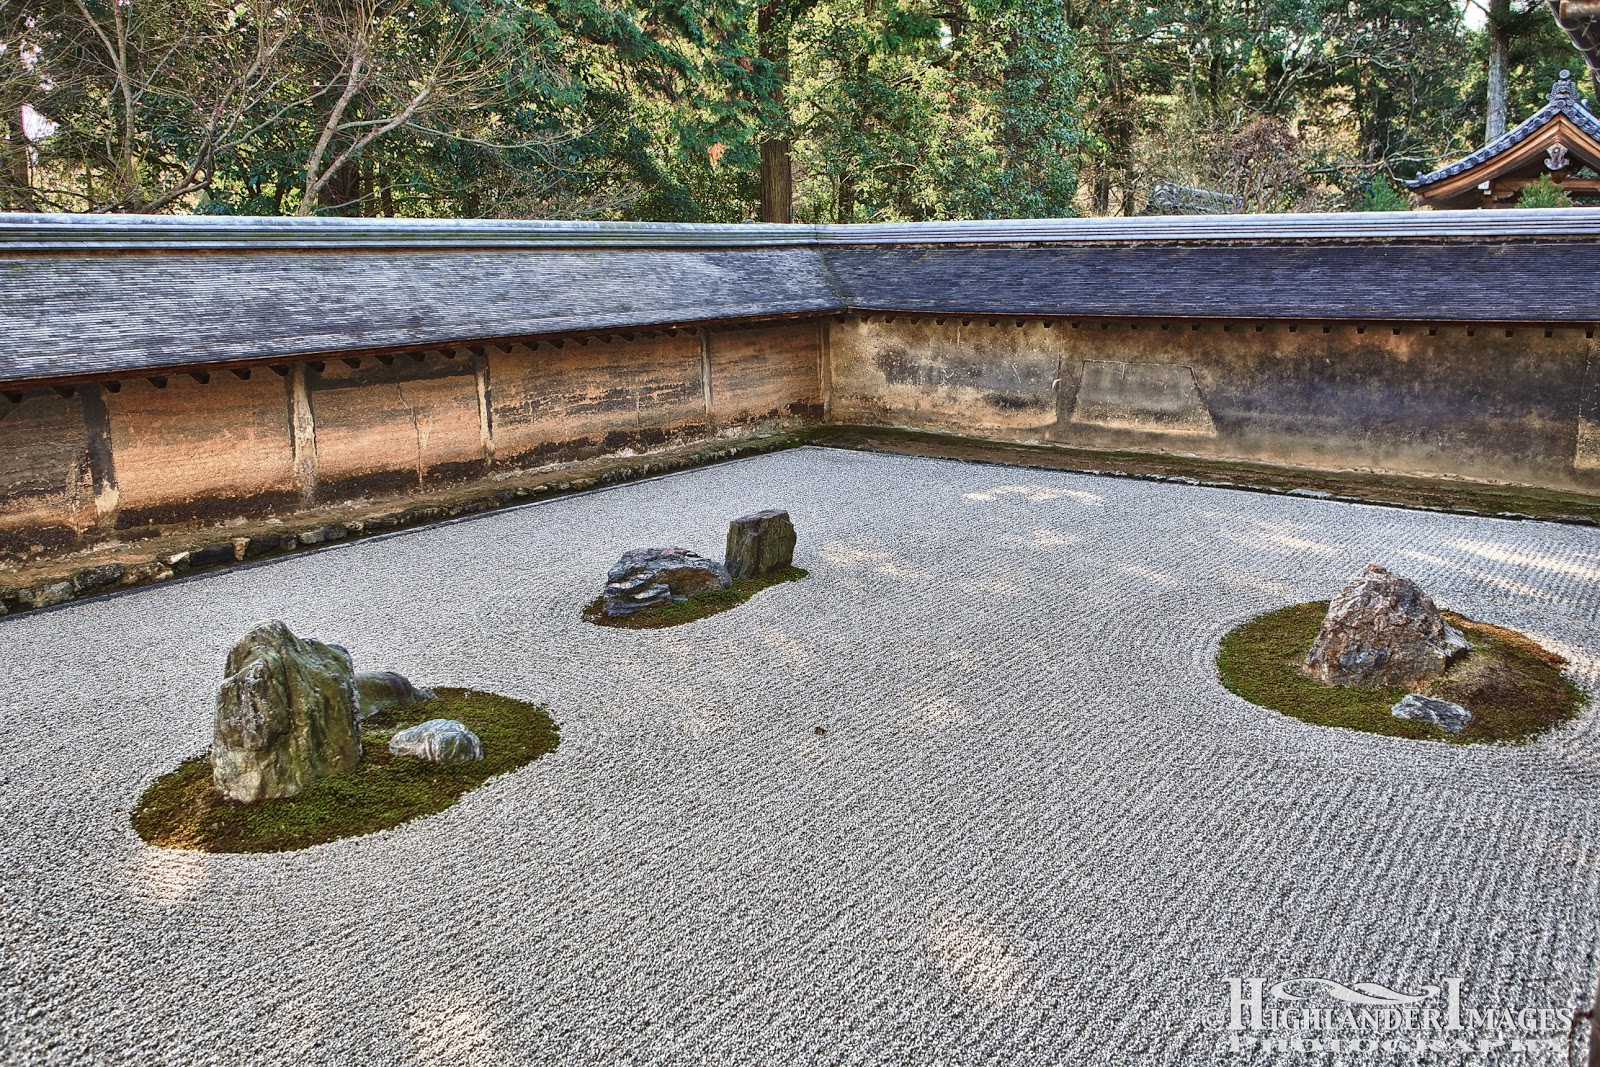 ryoan ji zen rock garden - Zen Rock Garden